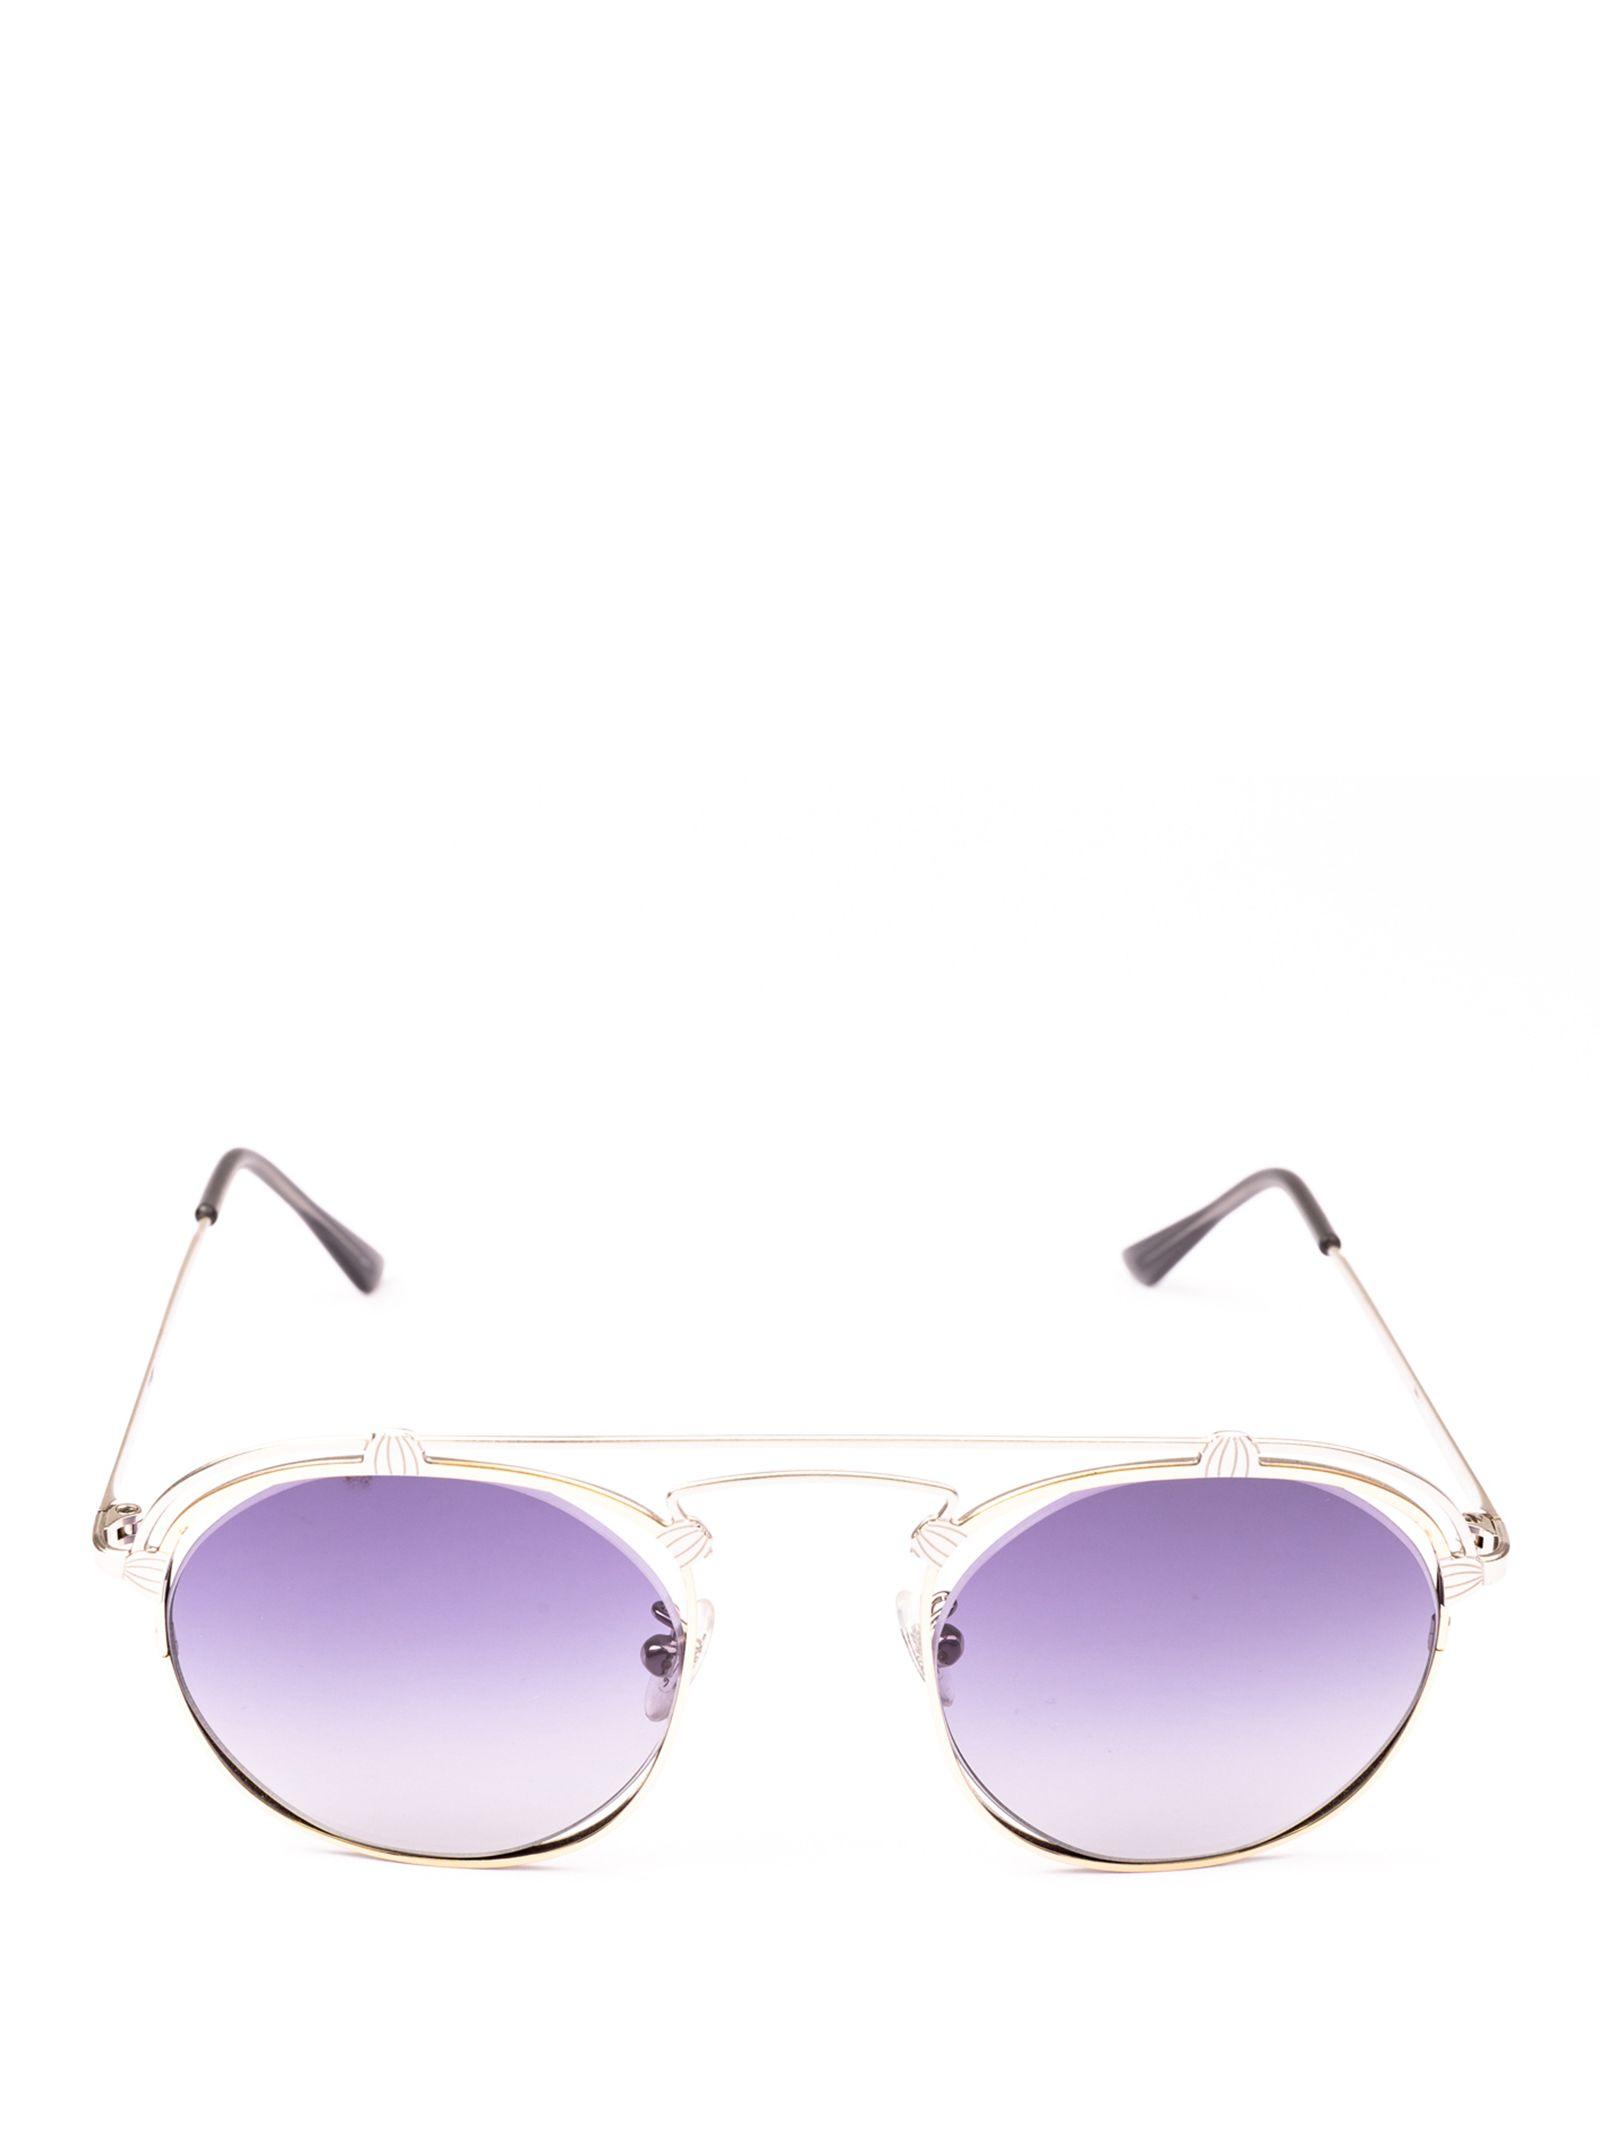 SPEKTRE Sunglasses in Cr02B